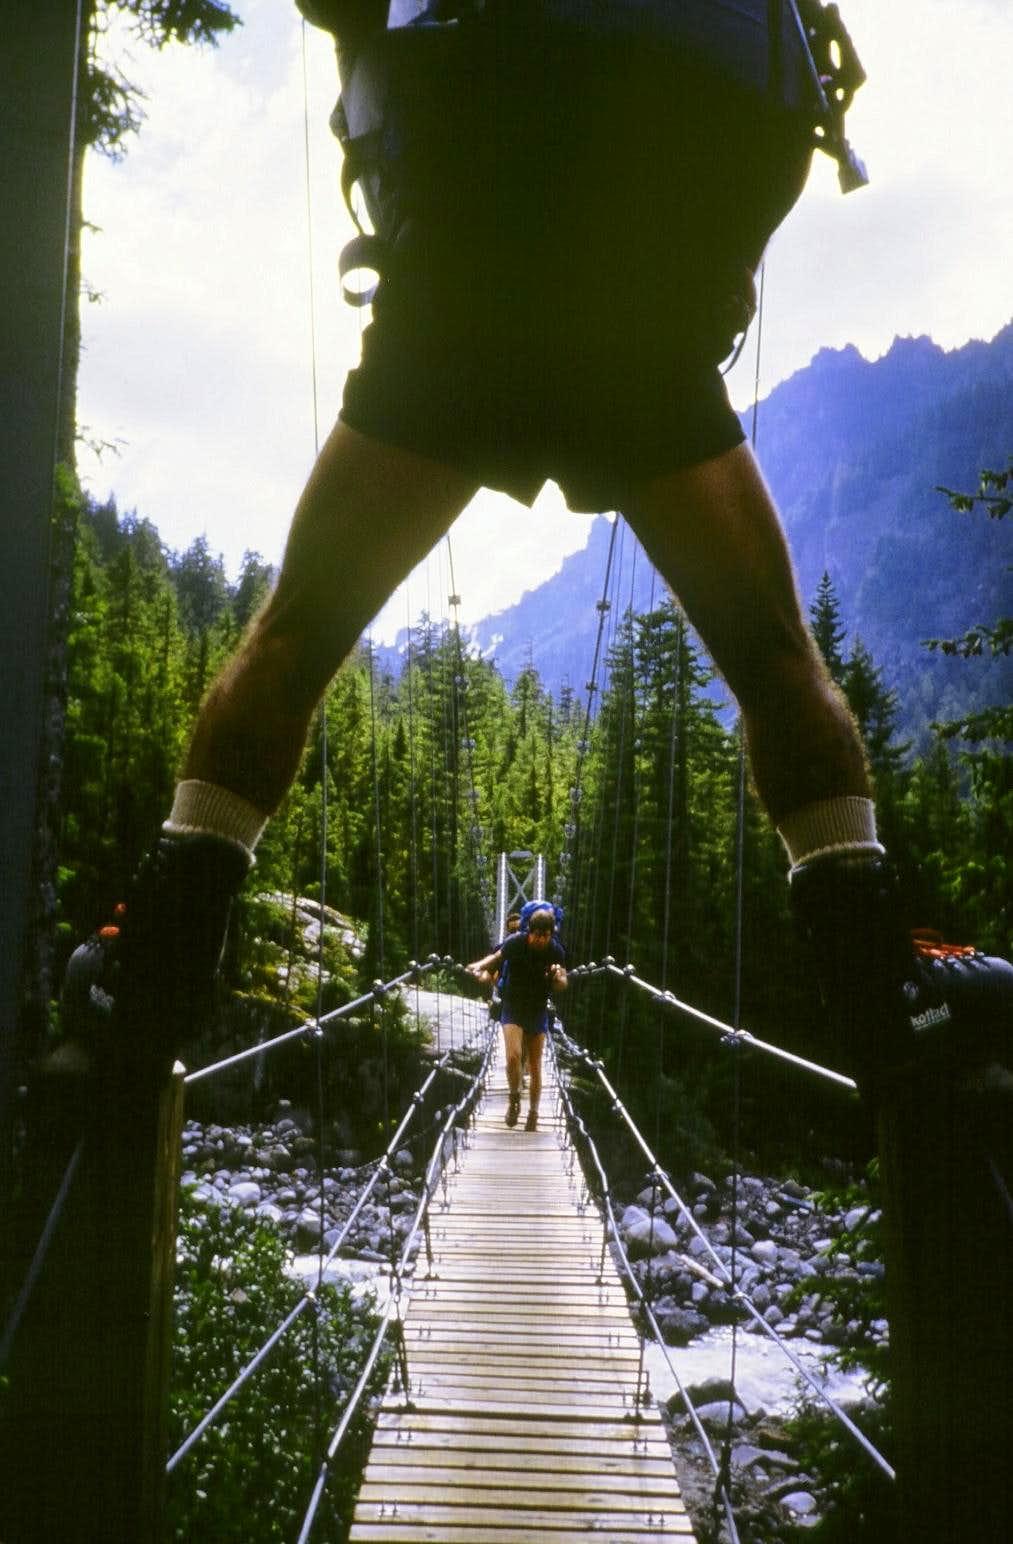 Crossing bridges can be FUN!